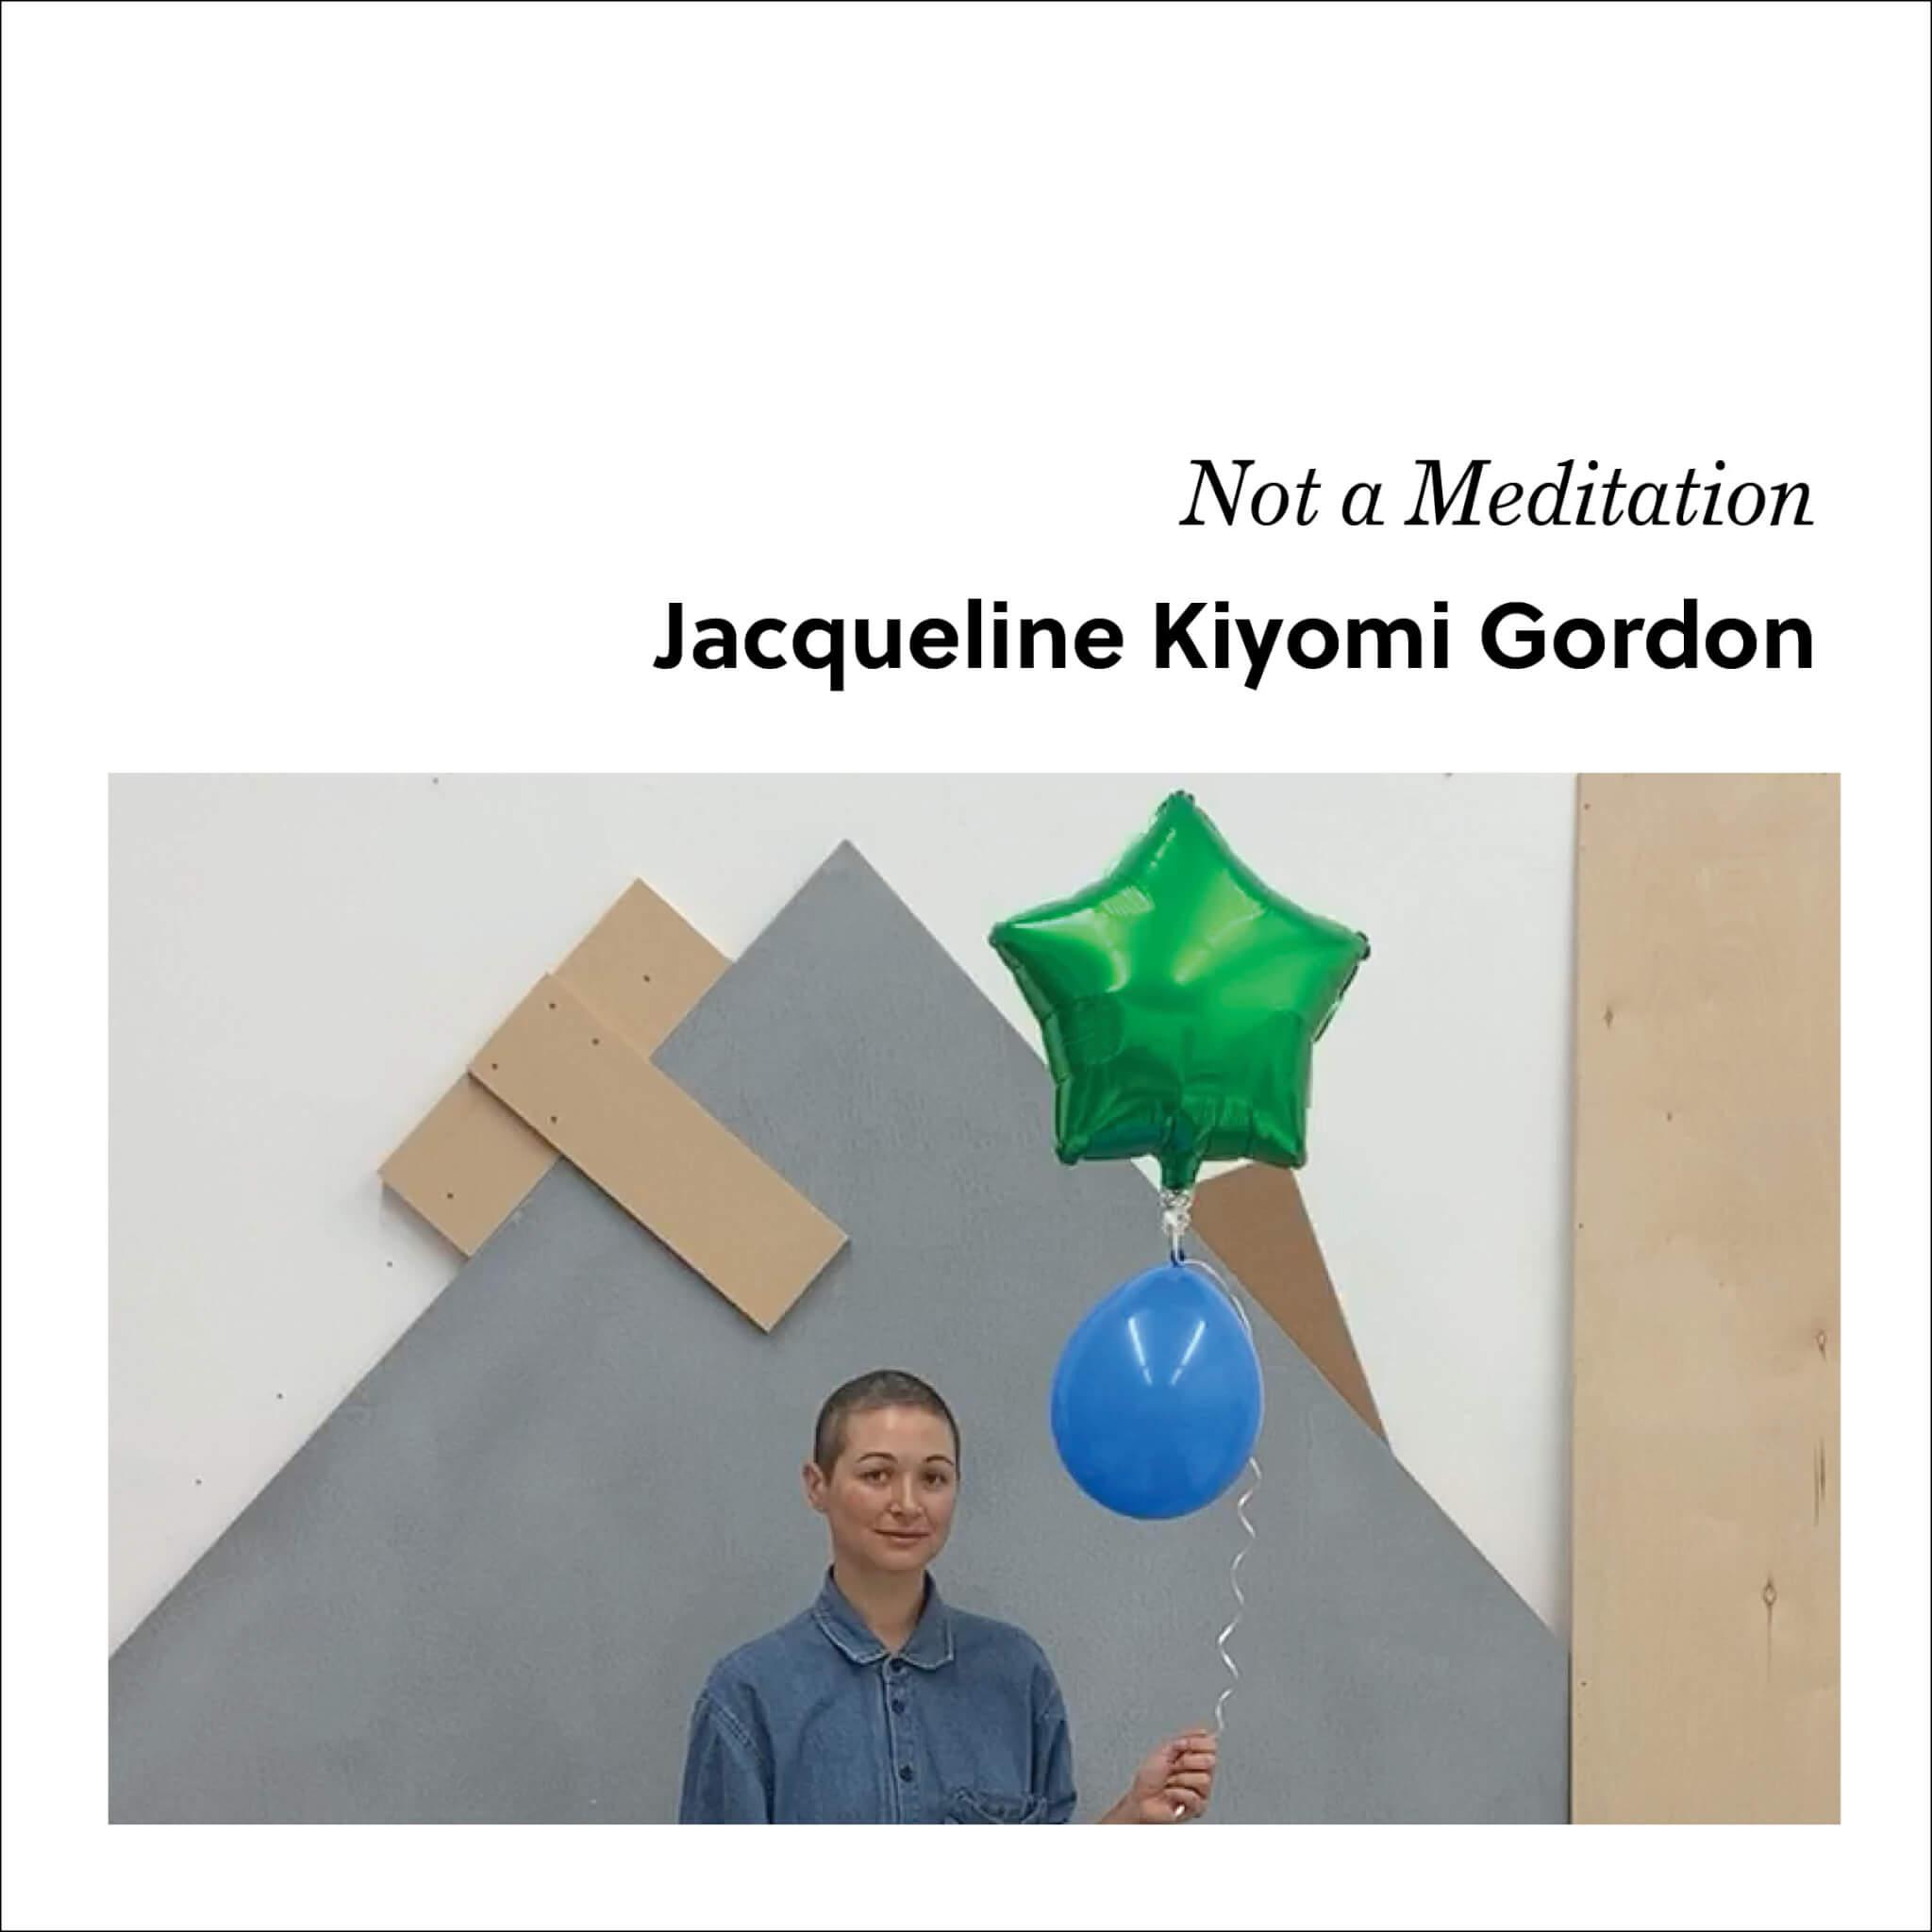 Week 3: Jacqueline Kiyomi Gordon